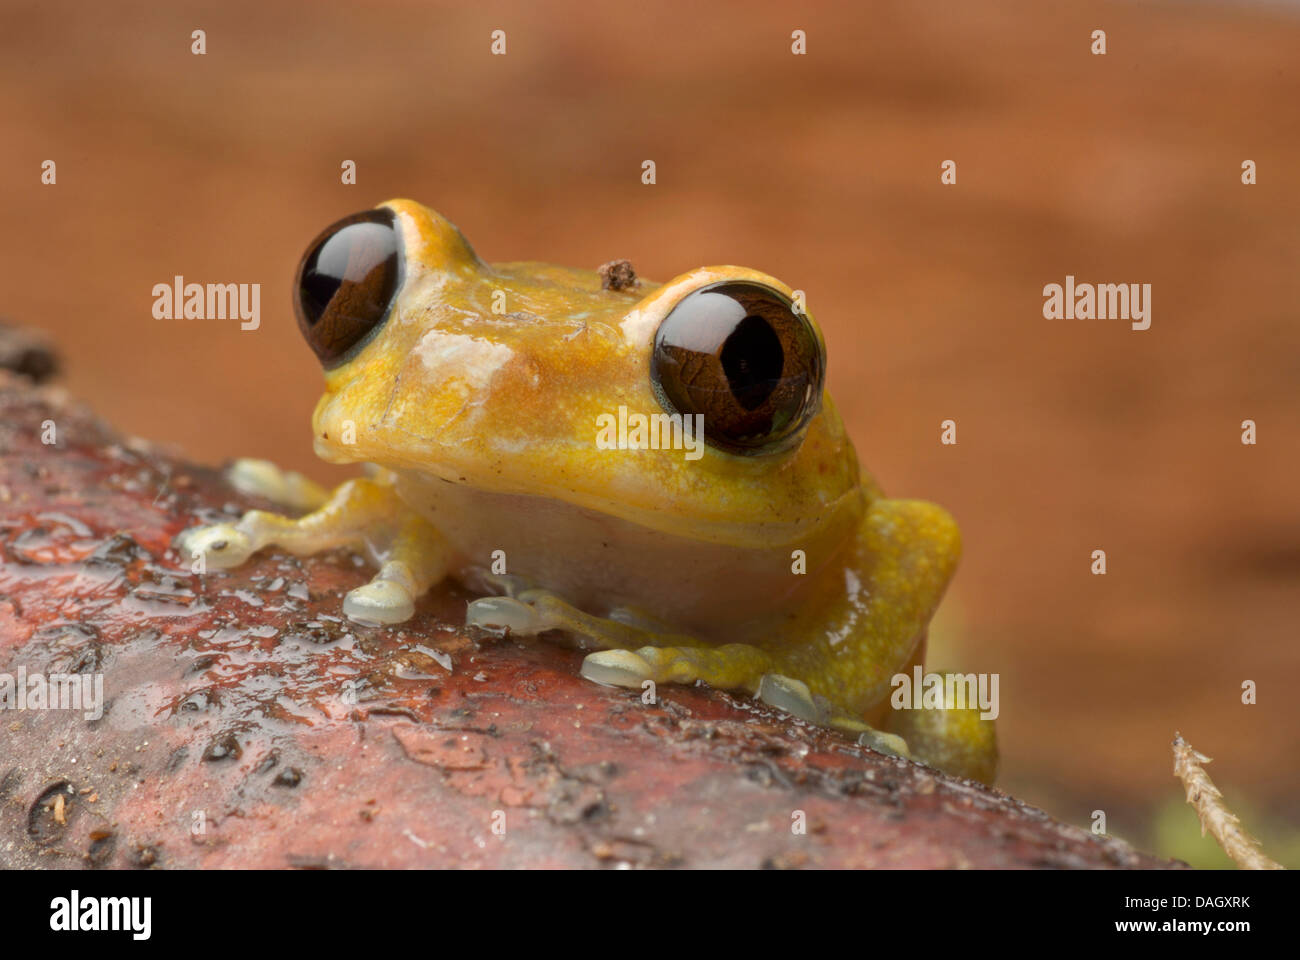 Ruby Eyed Treefrog (Leptopelis uluguruensis), portrait - Stock Image